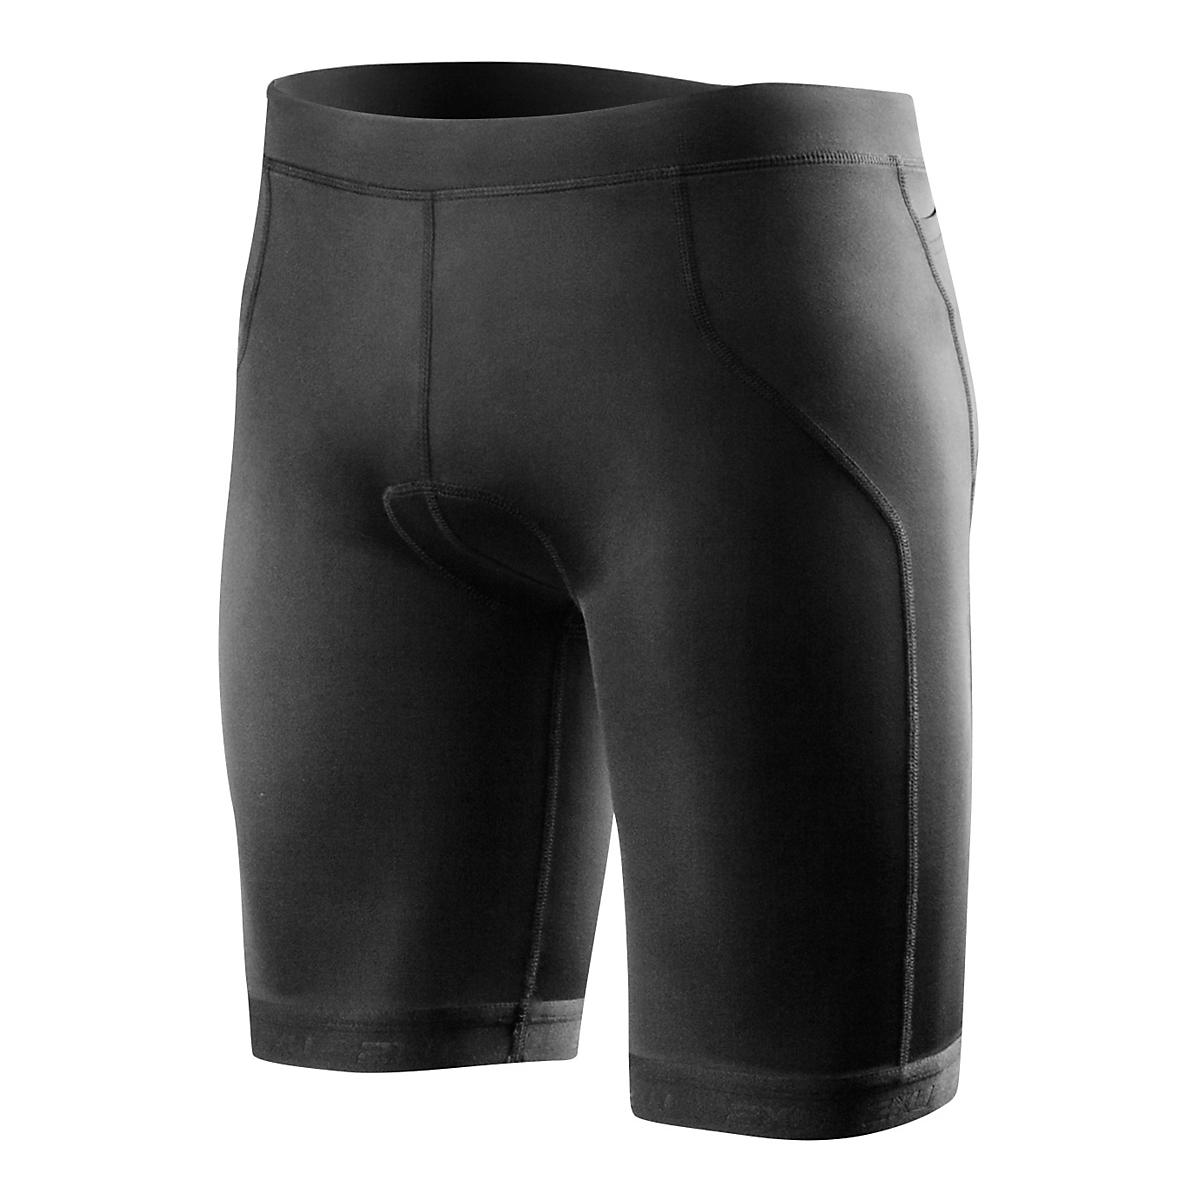 Men's 2XU�G:2 Active Tri Short